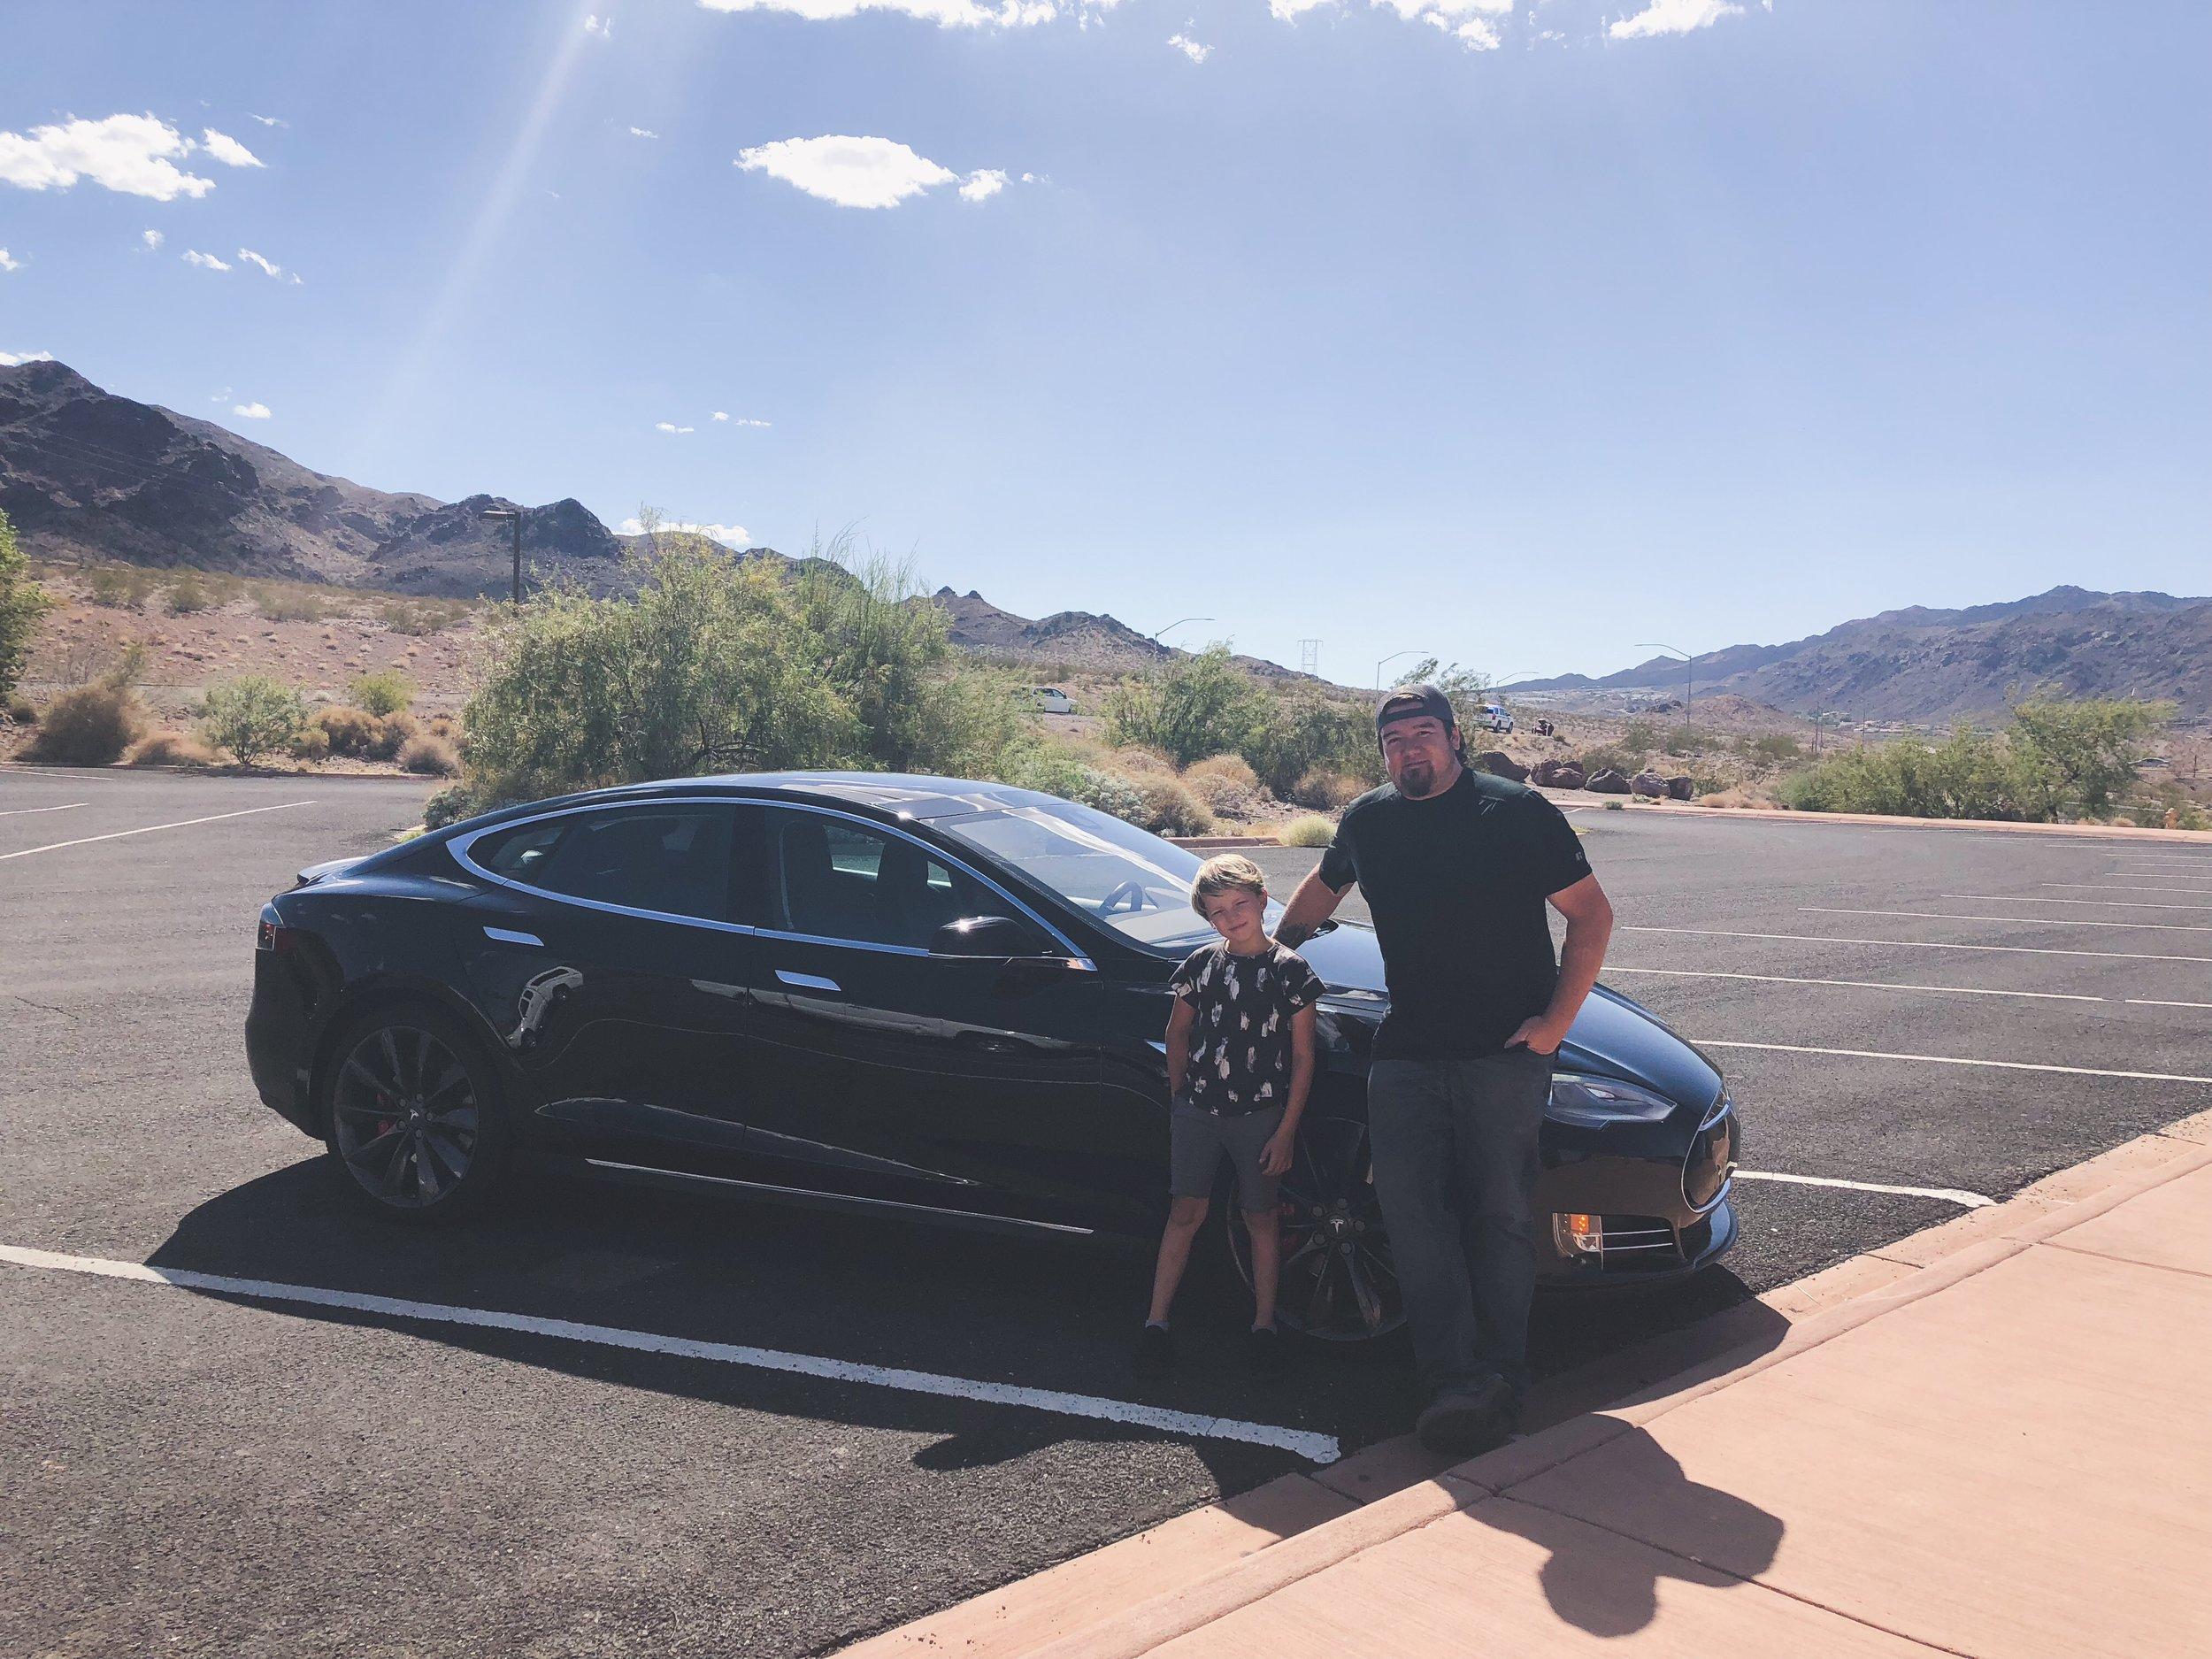 David Justin Woodbury, Addison Rae, Tesla P90D, Lake Mead